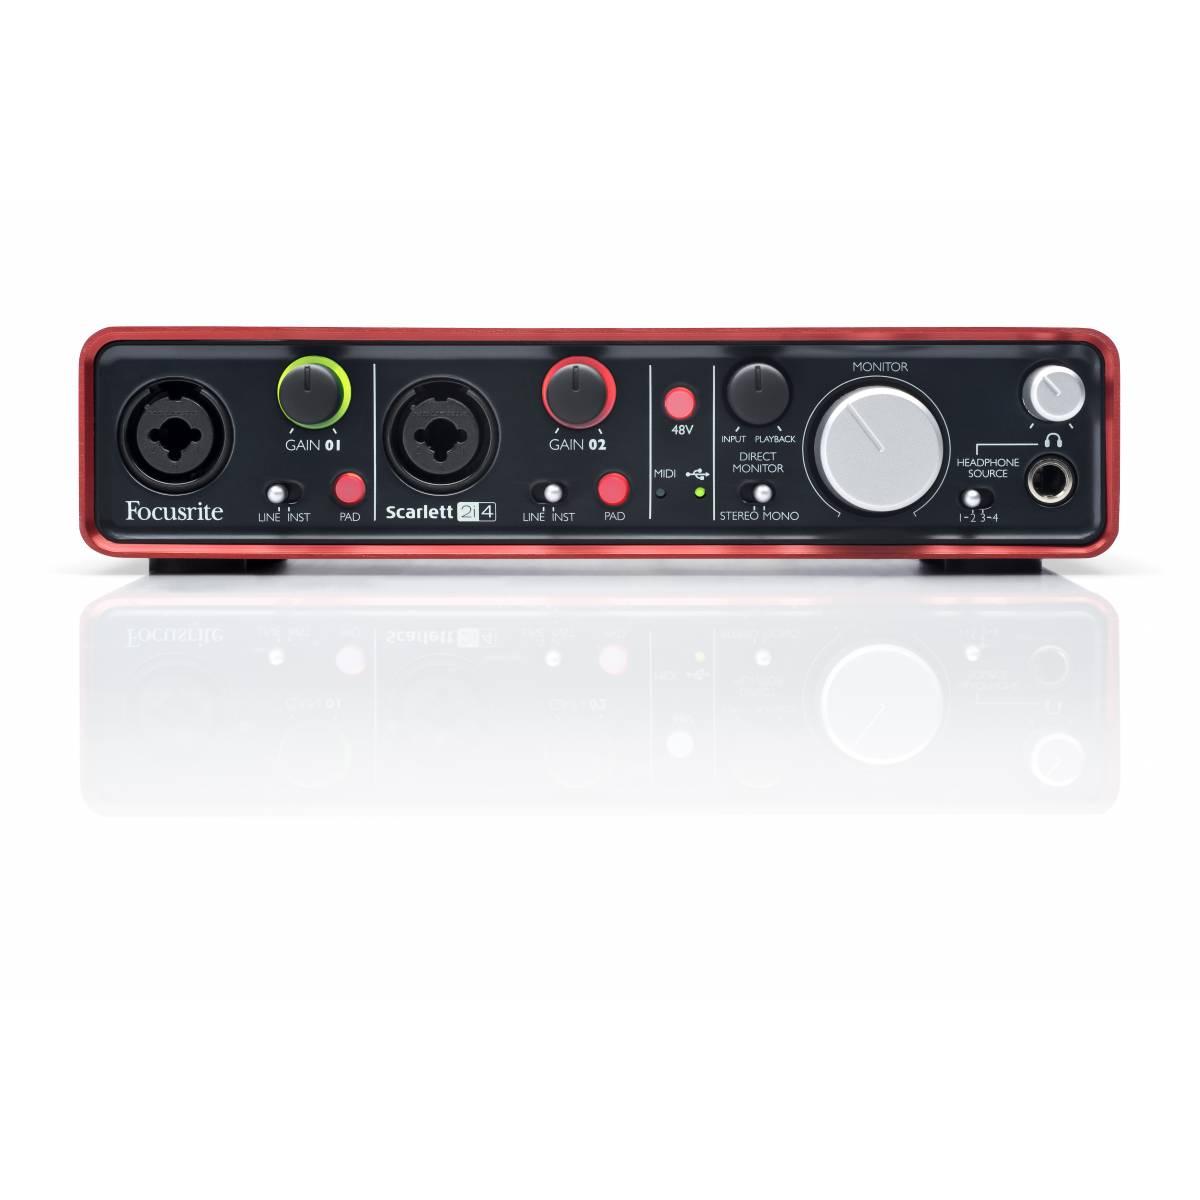 focusrite scarlett 2i4 usb audio interface   audio interfaces amp soundcards from inta audio uk